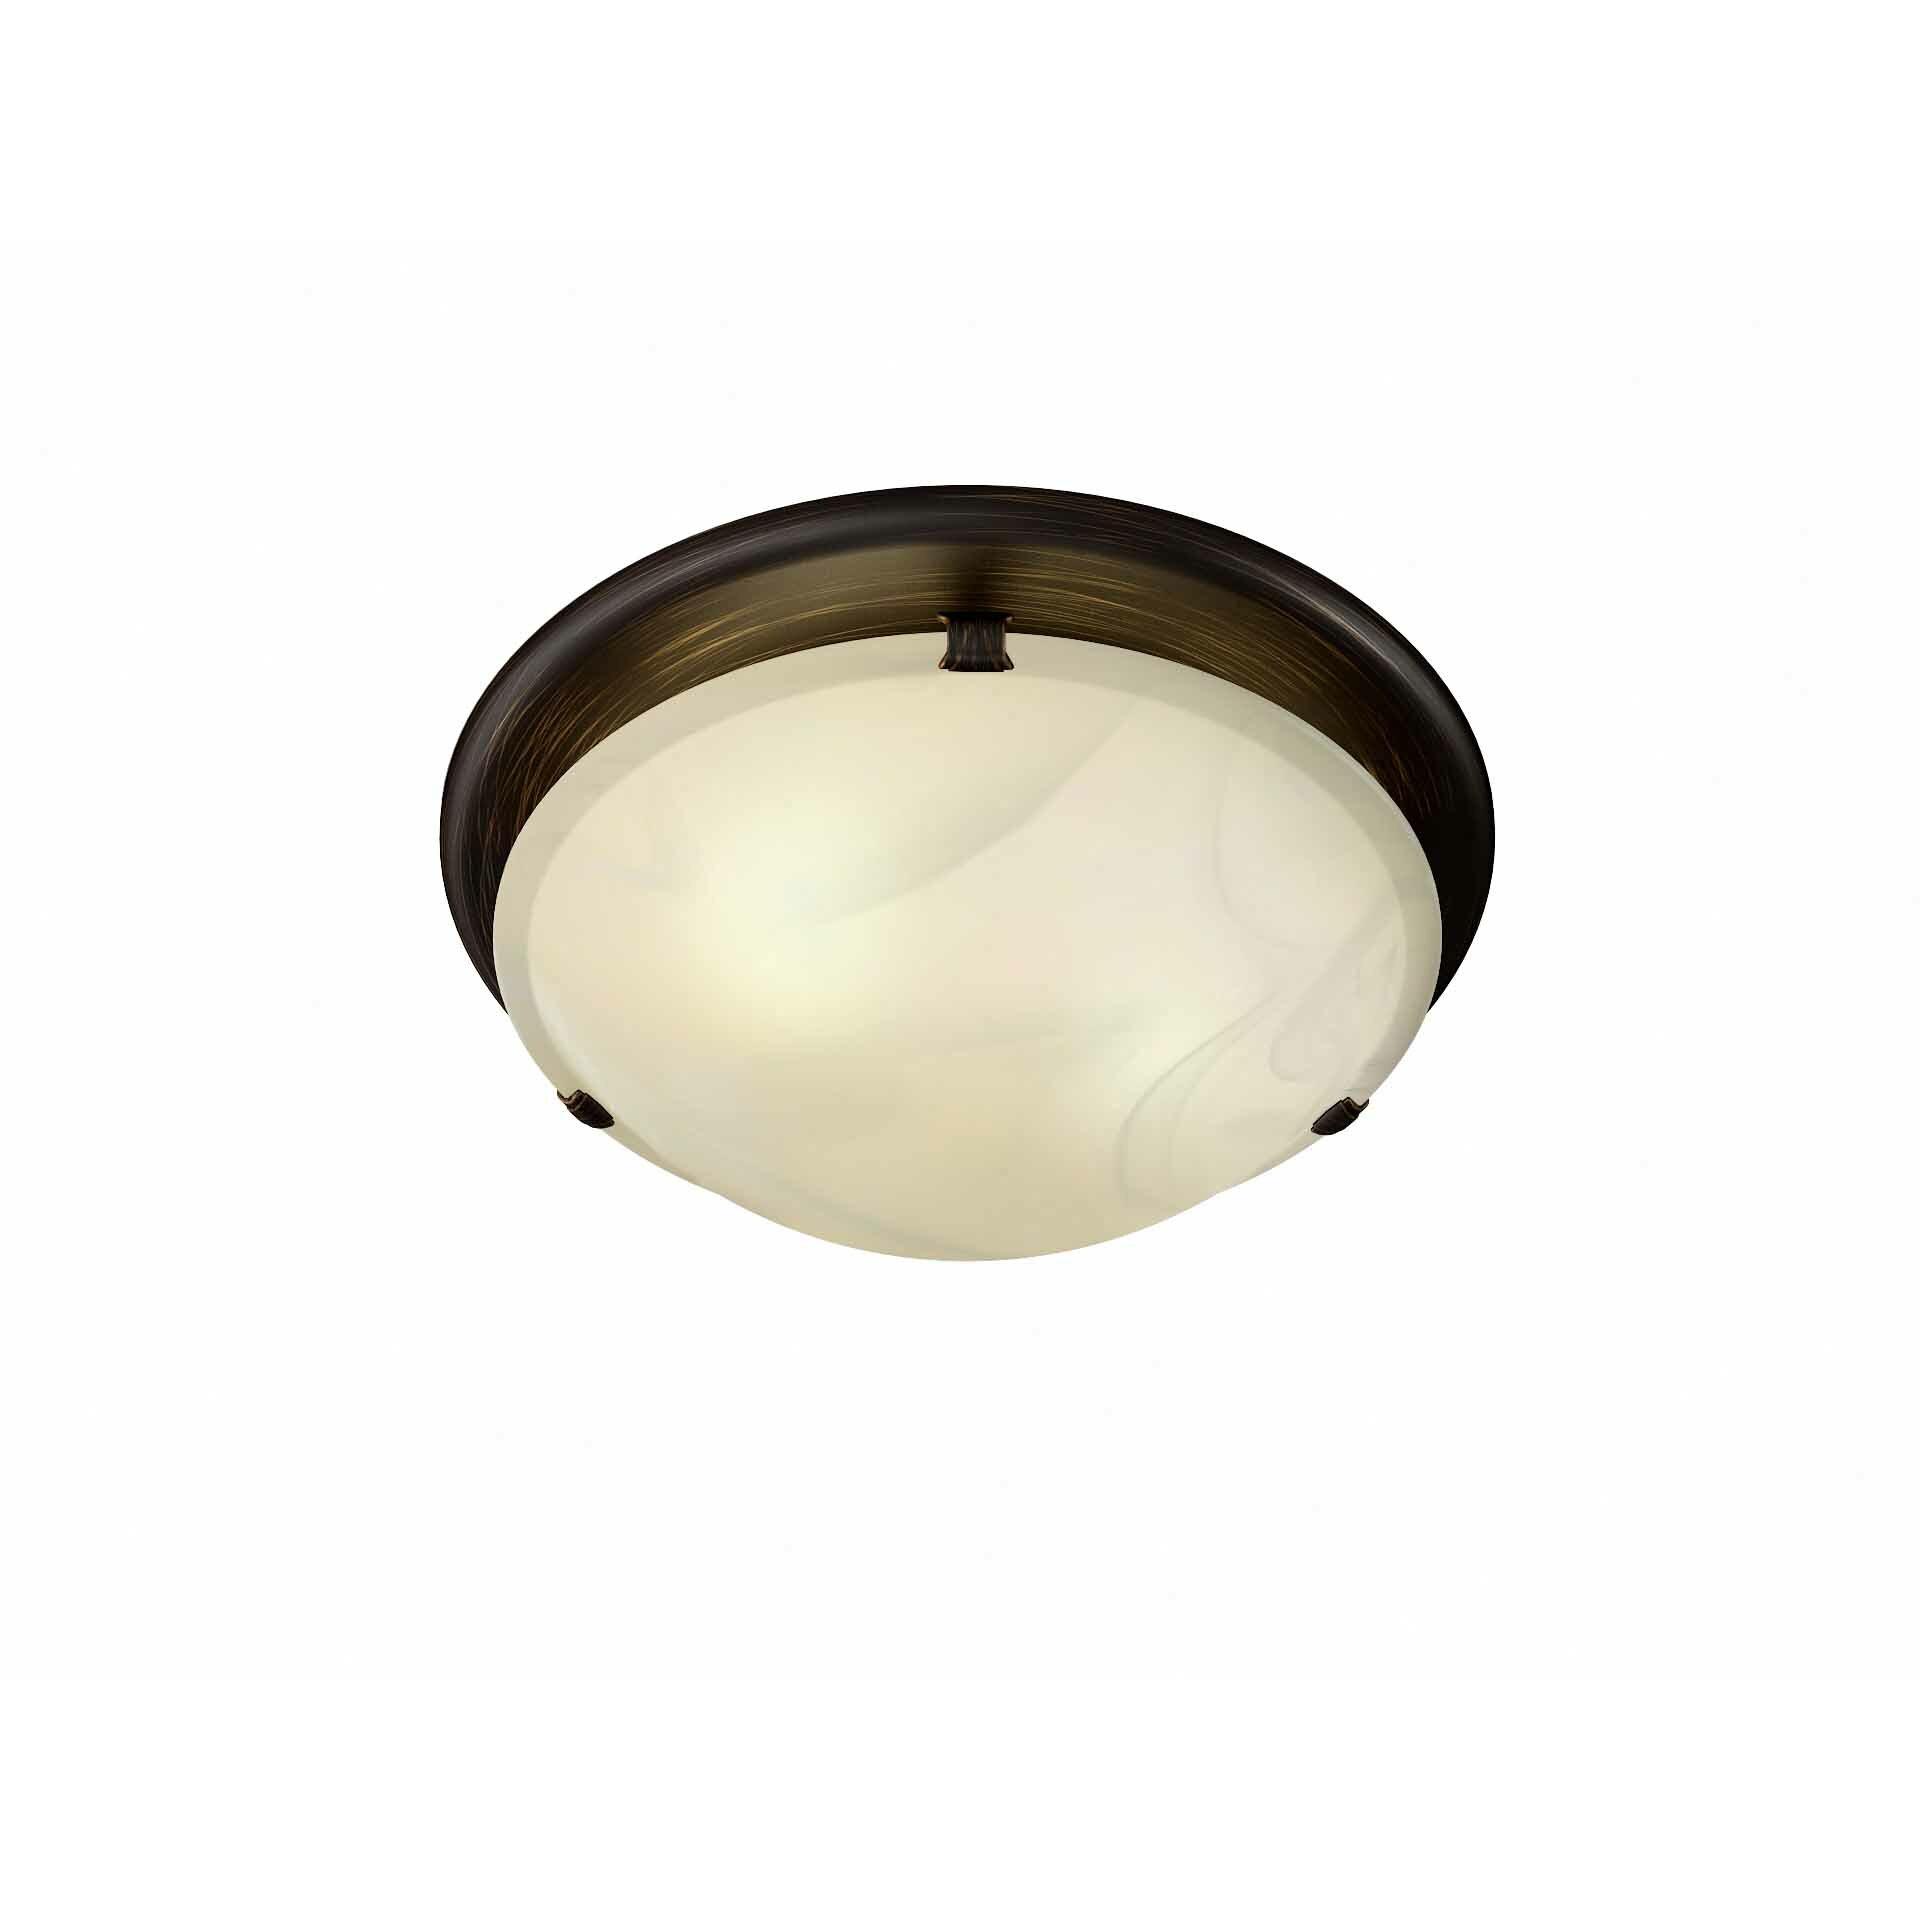 80 Cfm Bathroom Fan With Light Wayfair